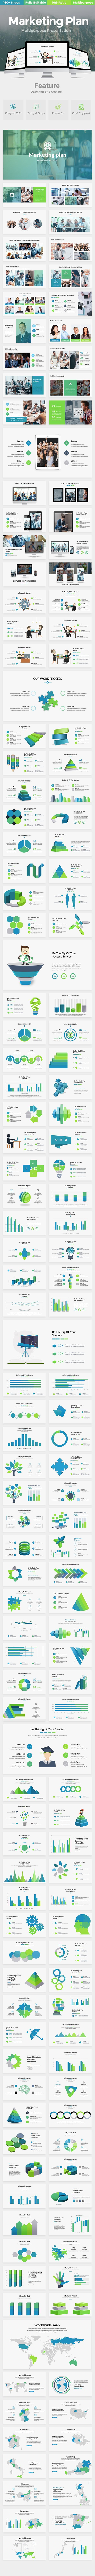 Marketing Plan Multipurpose Powerpoint Template - Business PowerPoint Templates